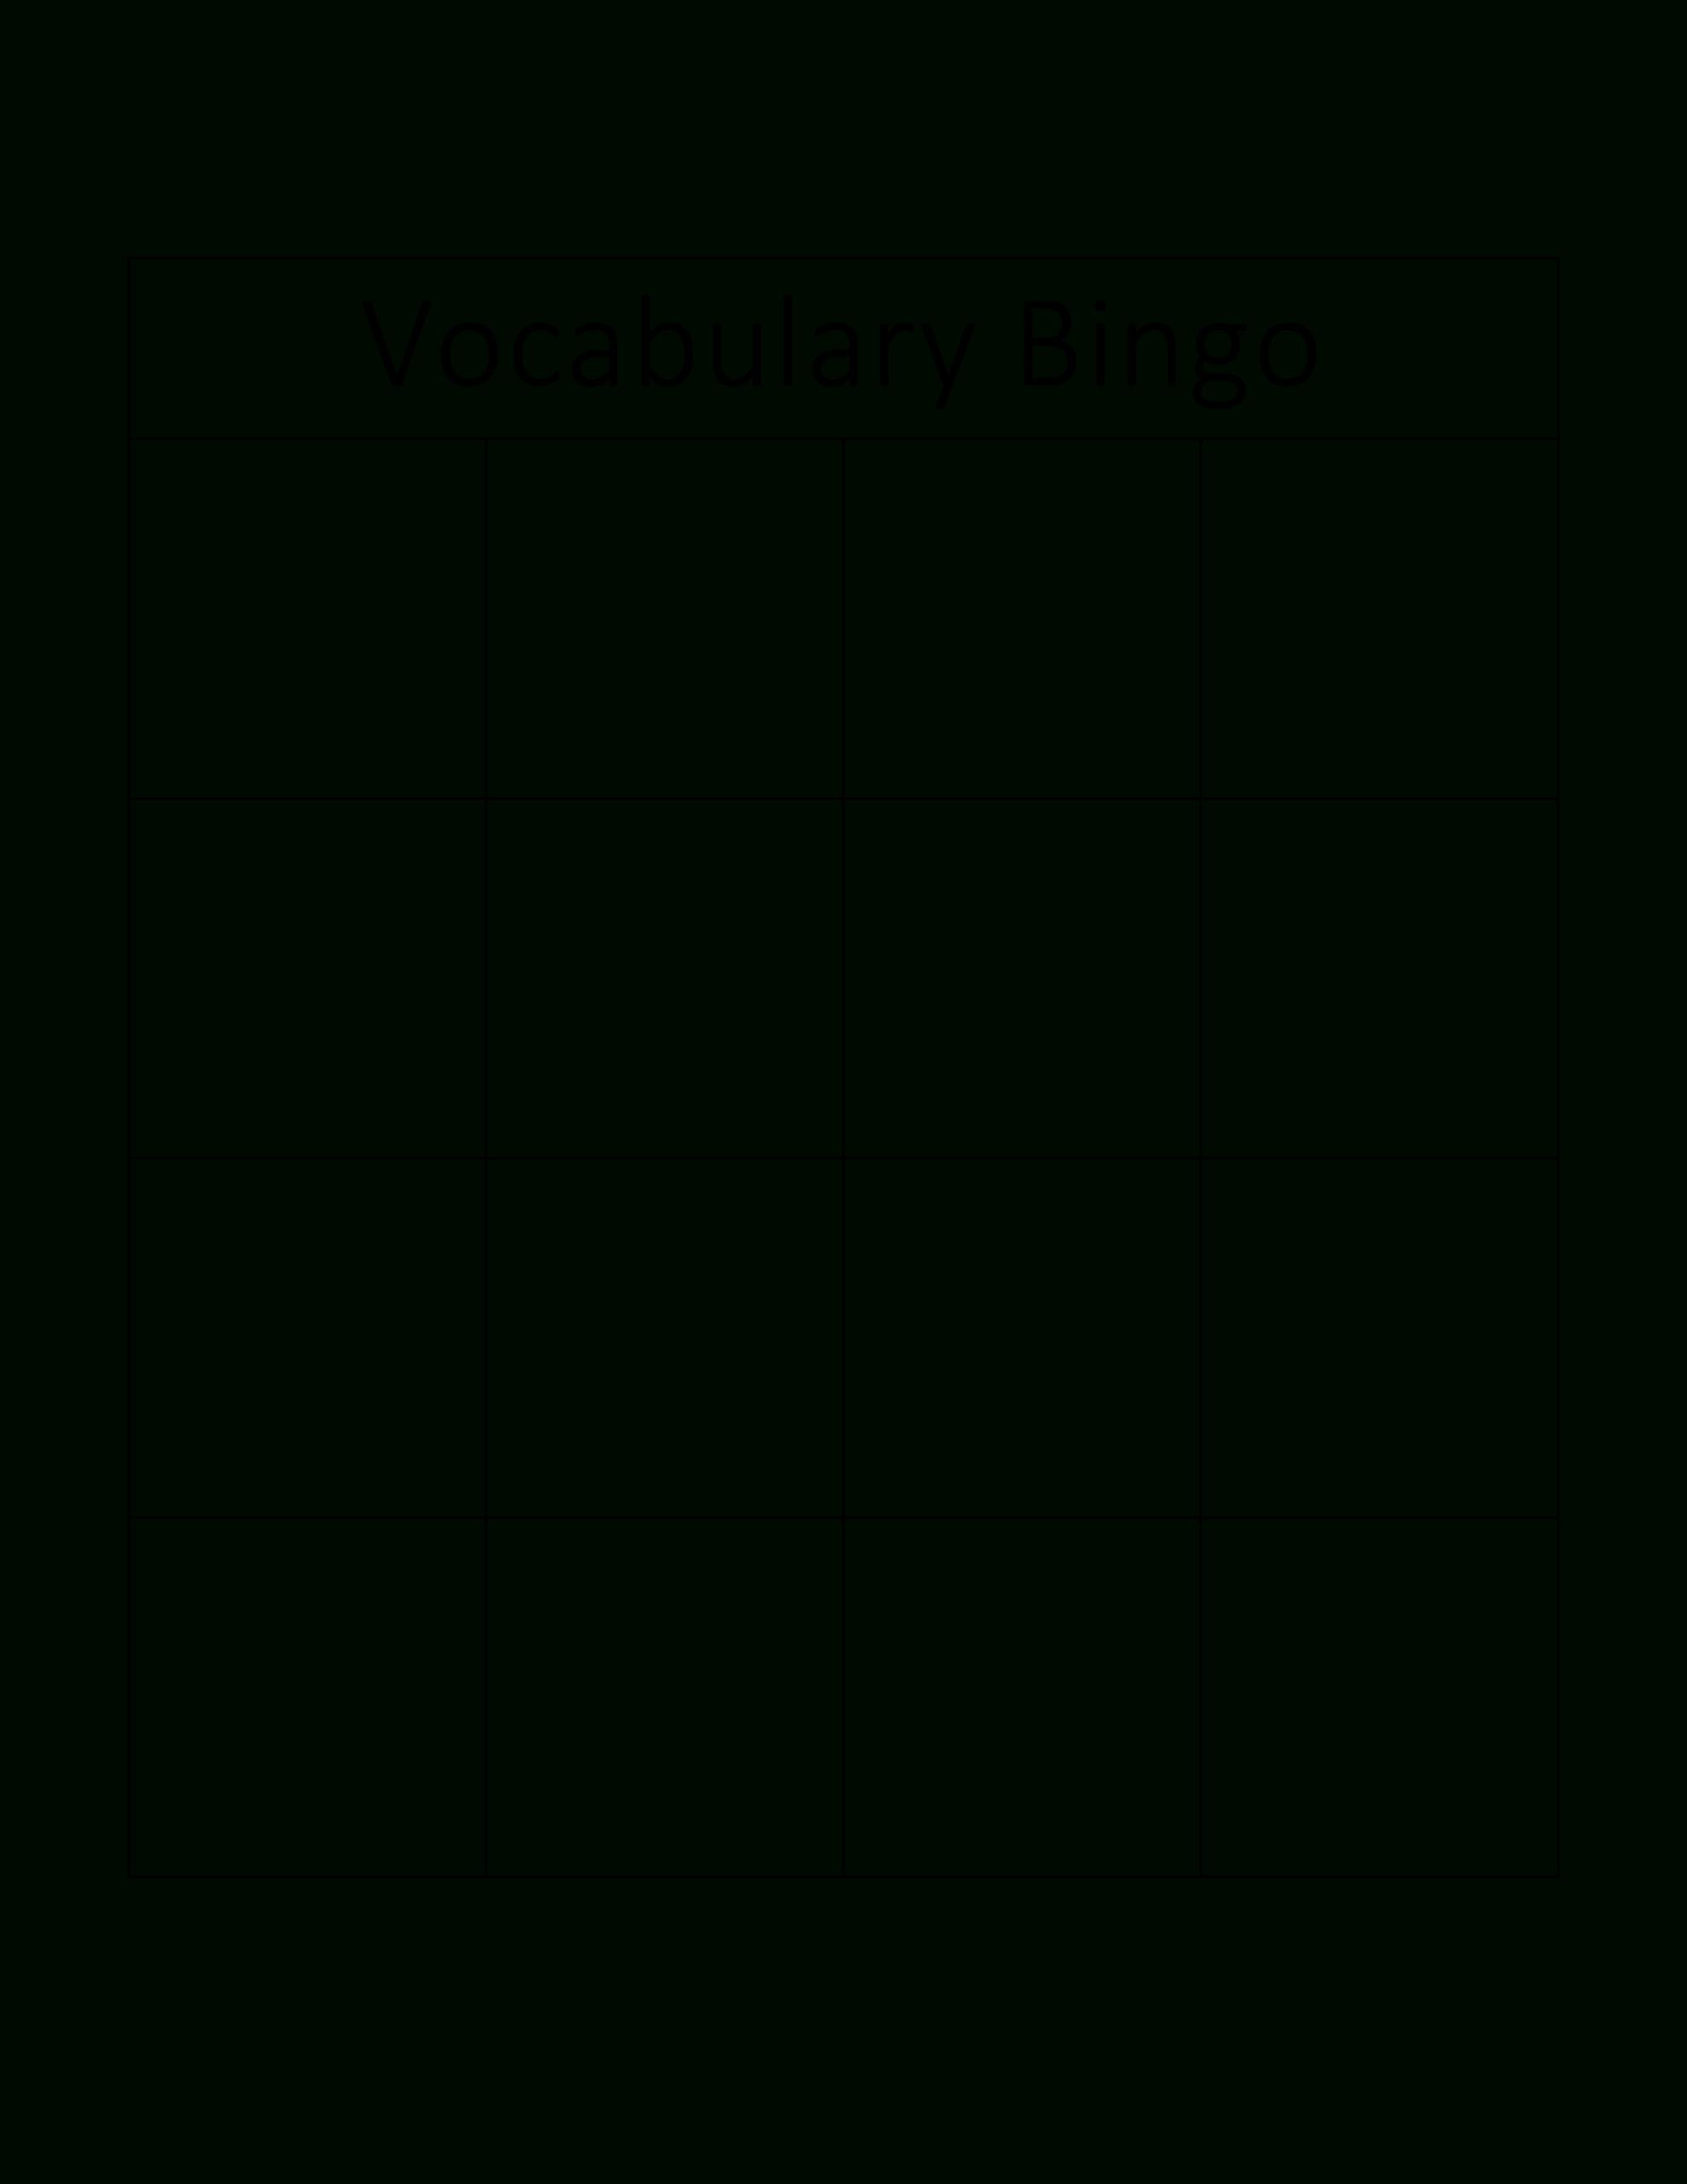 Vocabulary Bingo Card   Templates At Allbusinesstemplates Intended For Blank Bingo Card Template Microsoft Word